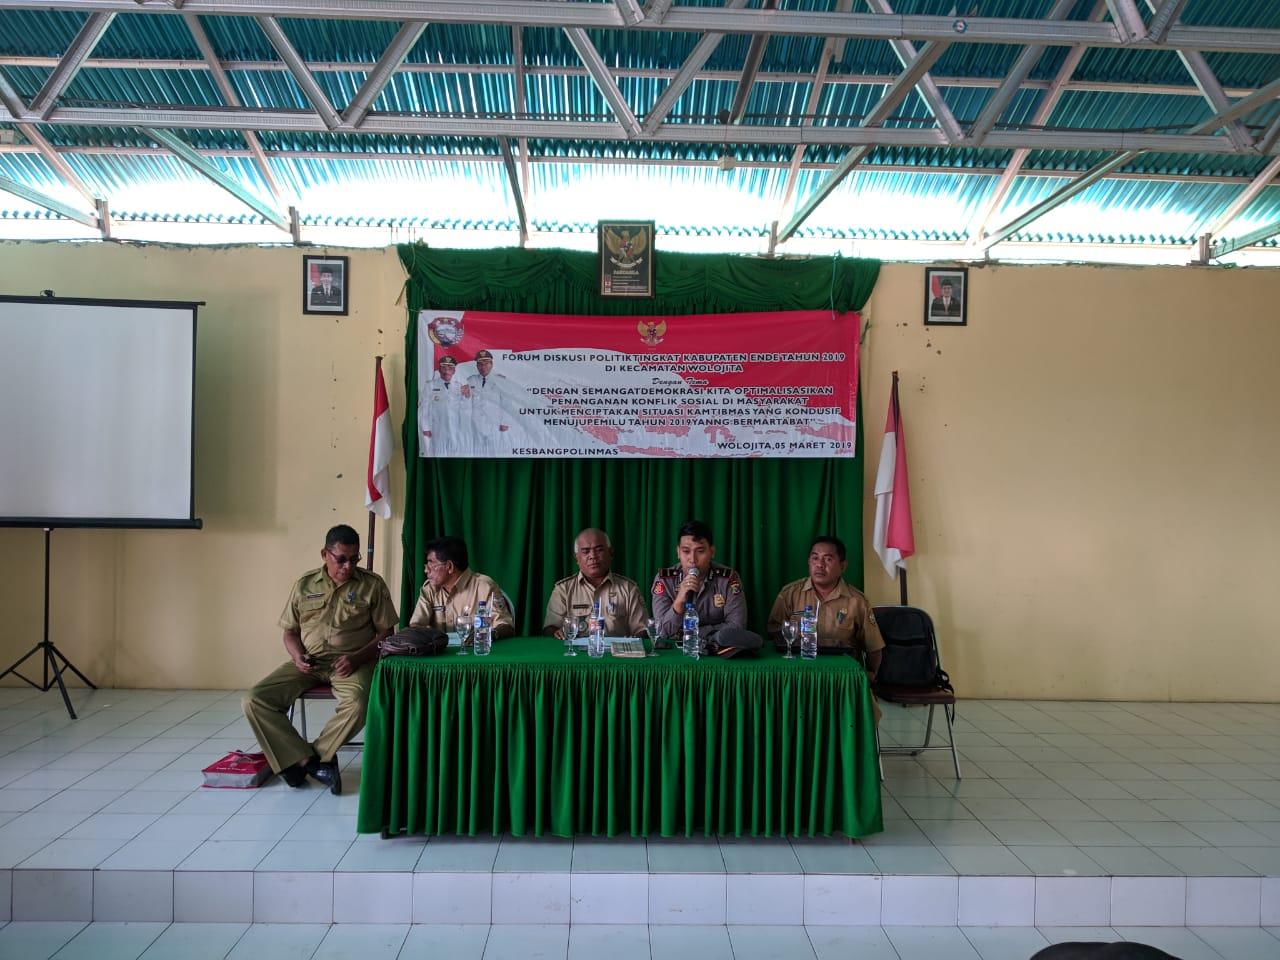 Kapolsek Wolowaru Hadiri Giat Forum Diskusi Politik Tingkat Kabupaten Ende Tahun 2019 di Kecamatan Wolojita